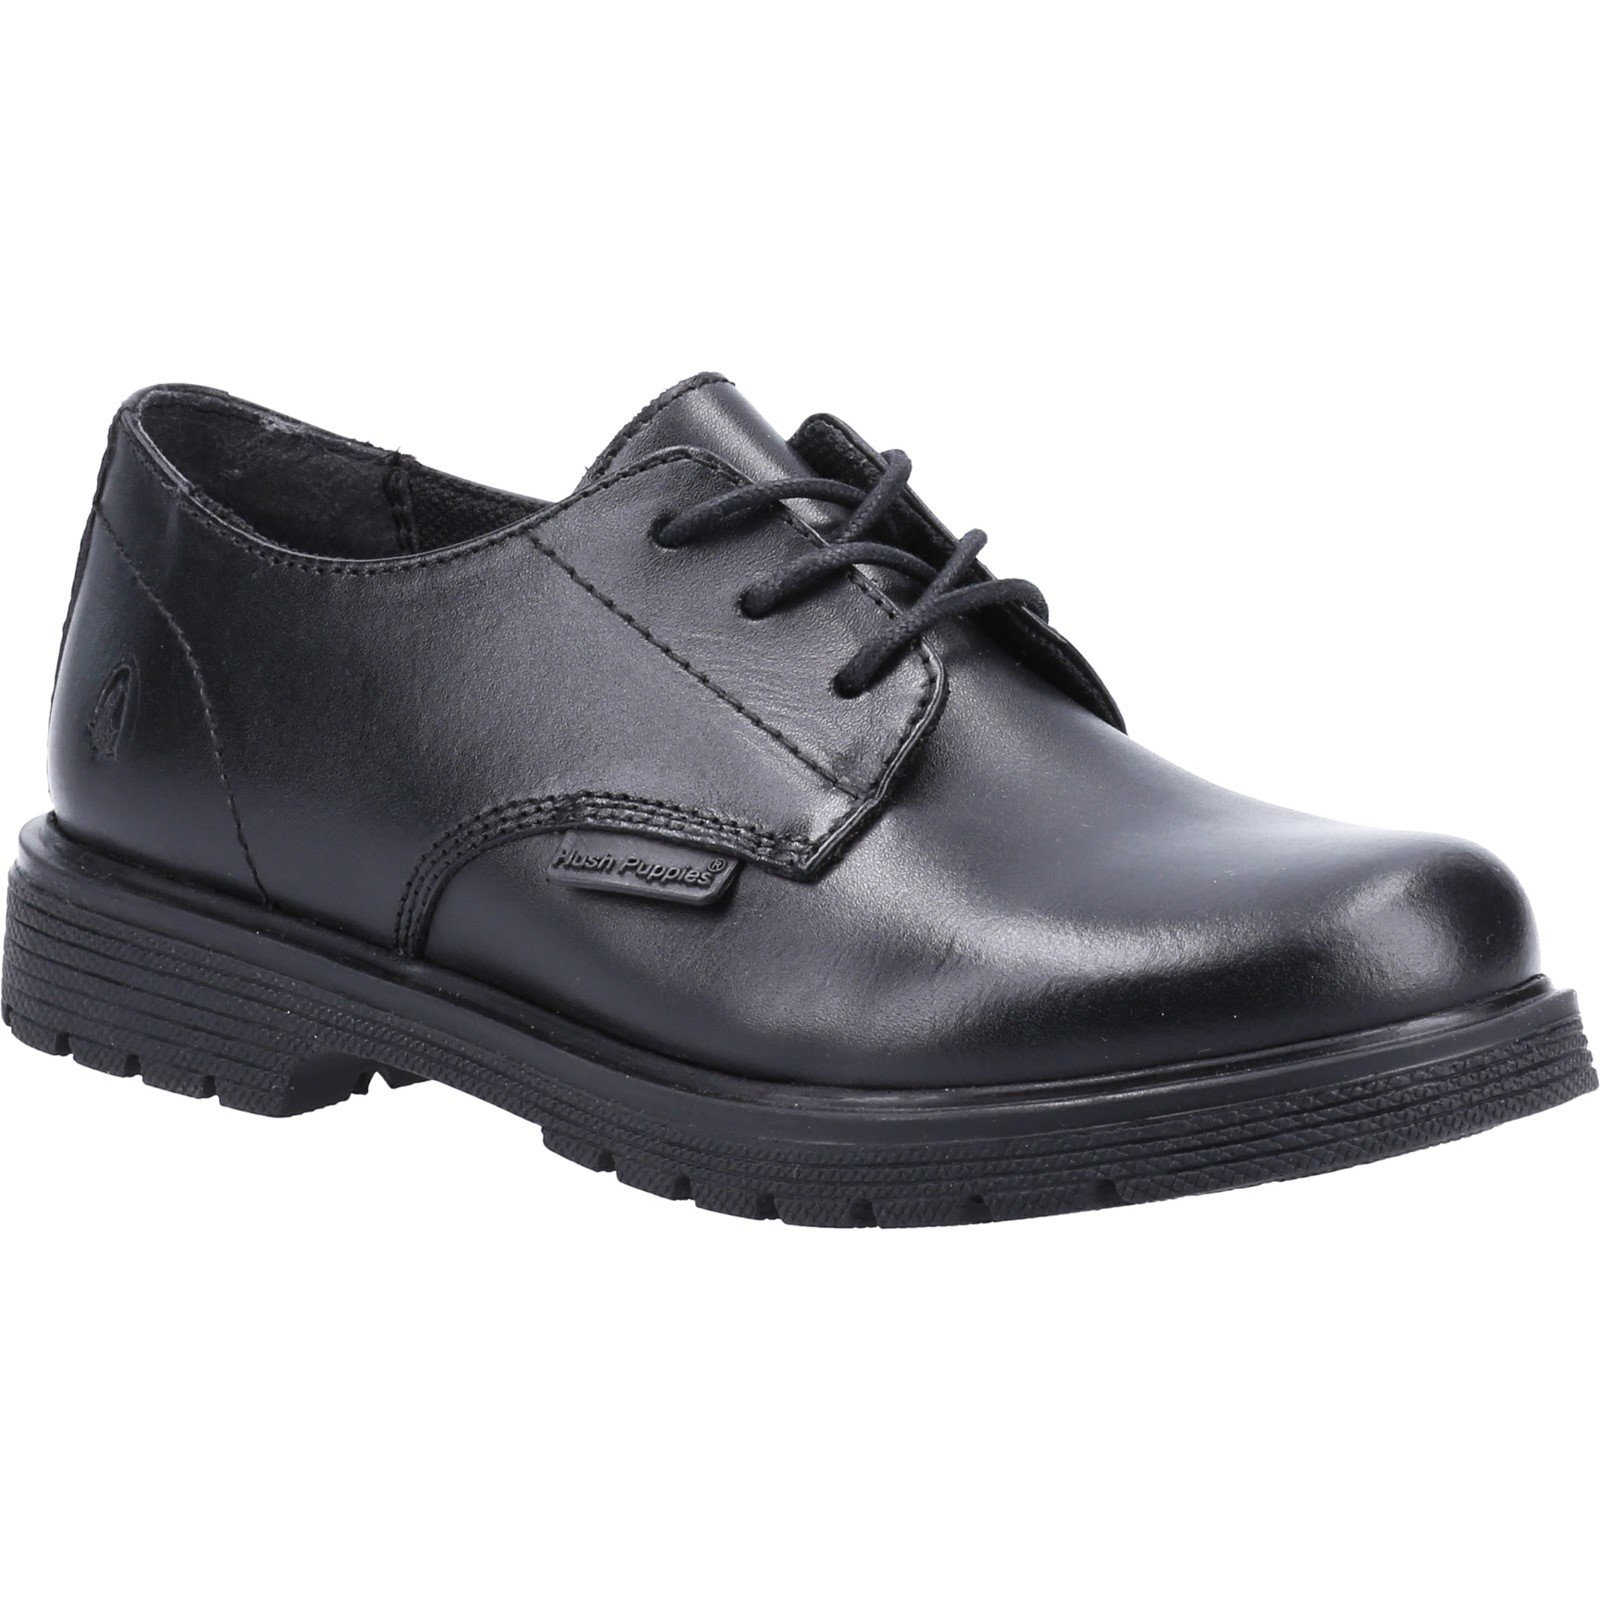 Hush Puppies Kid's Remi Senior School Derby Shoe Black 32613 - Black 4